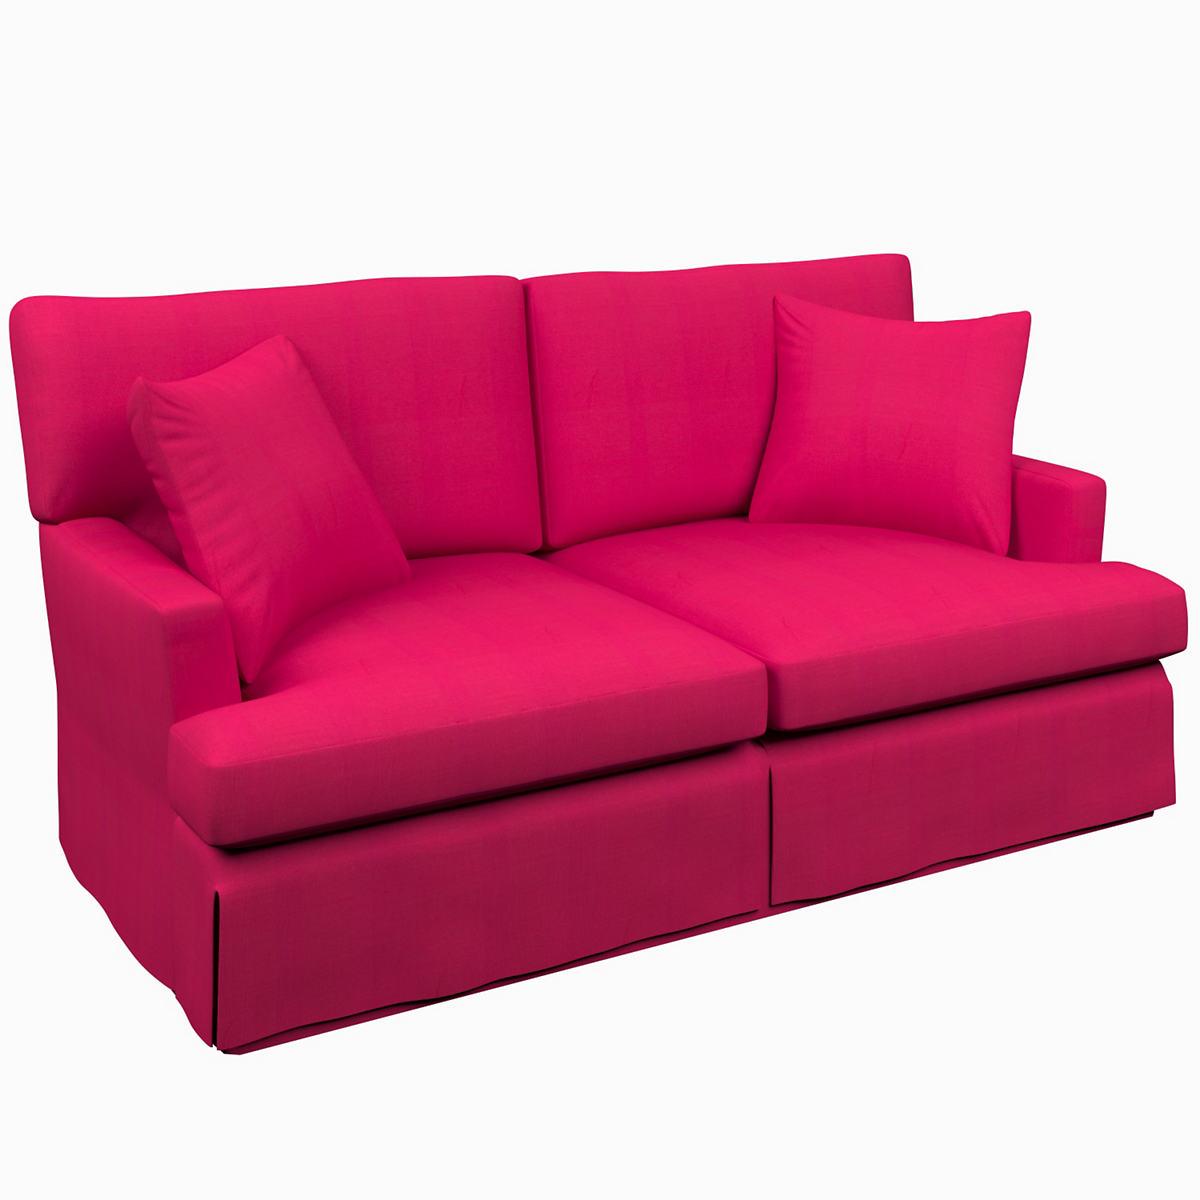 Estate Linen Fuchsia Saybrook 2 Seater Upholstered Sofa